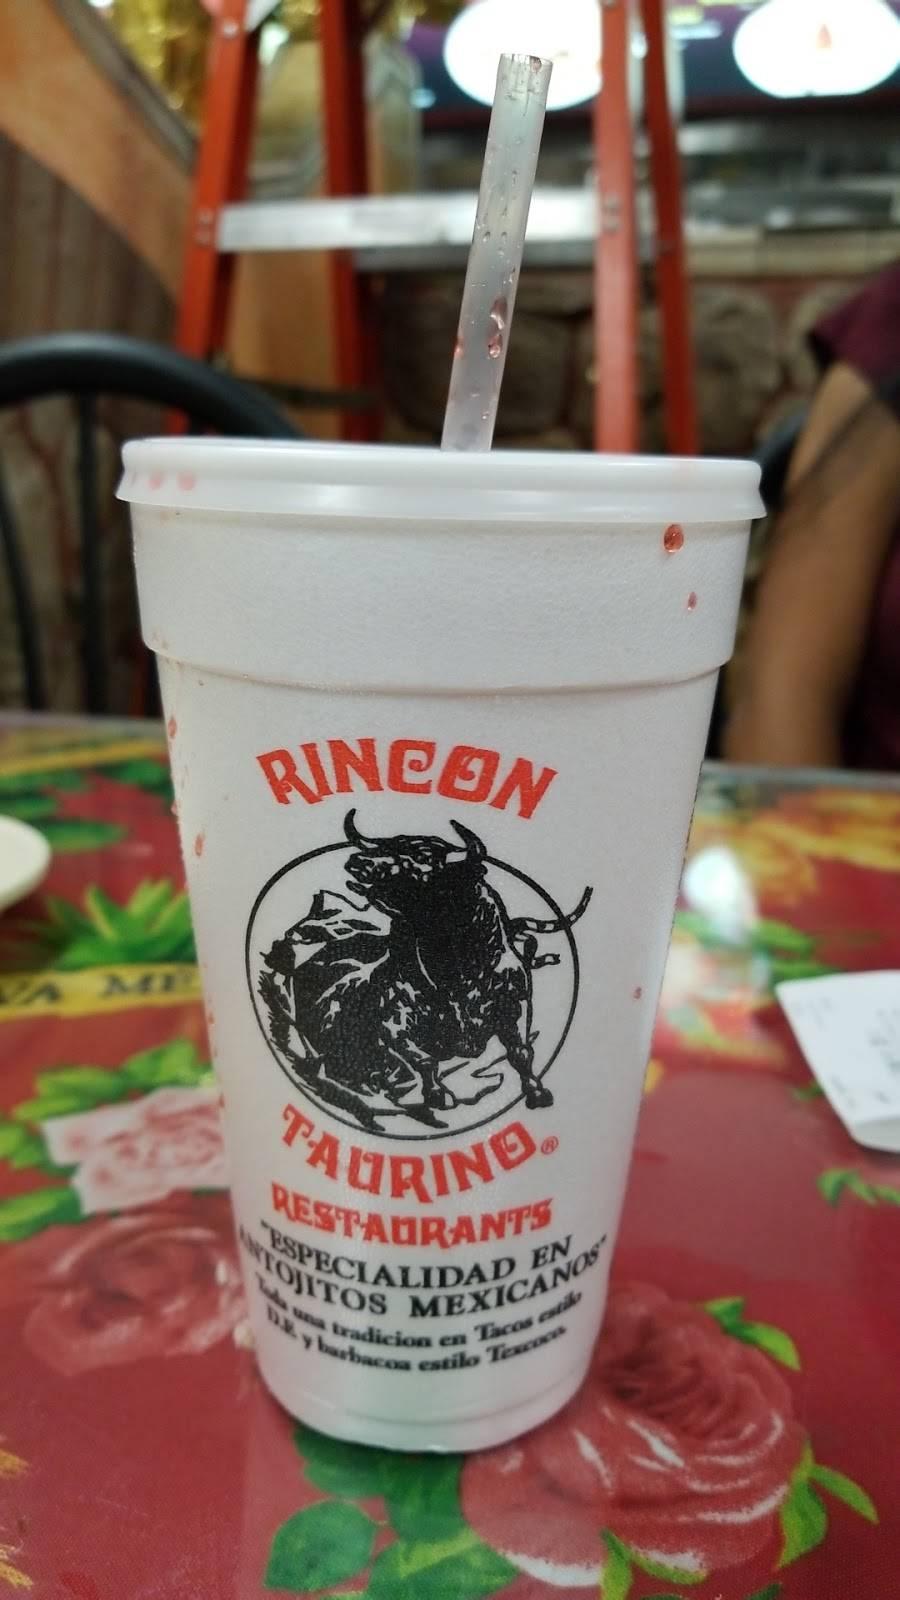 Rincon Taurino Restaurant | restaurant | 4552 Riverside Dr, Chino, CA 91710, USA | 9095905815 OR +1 909-590-5815